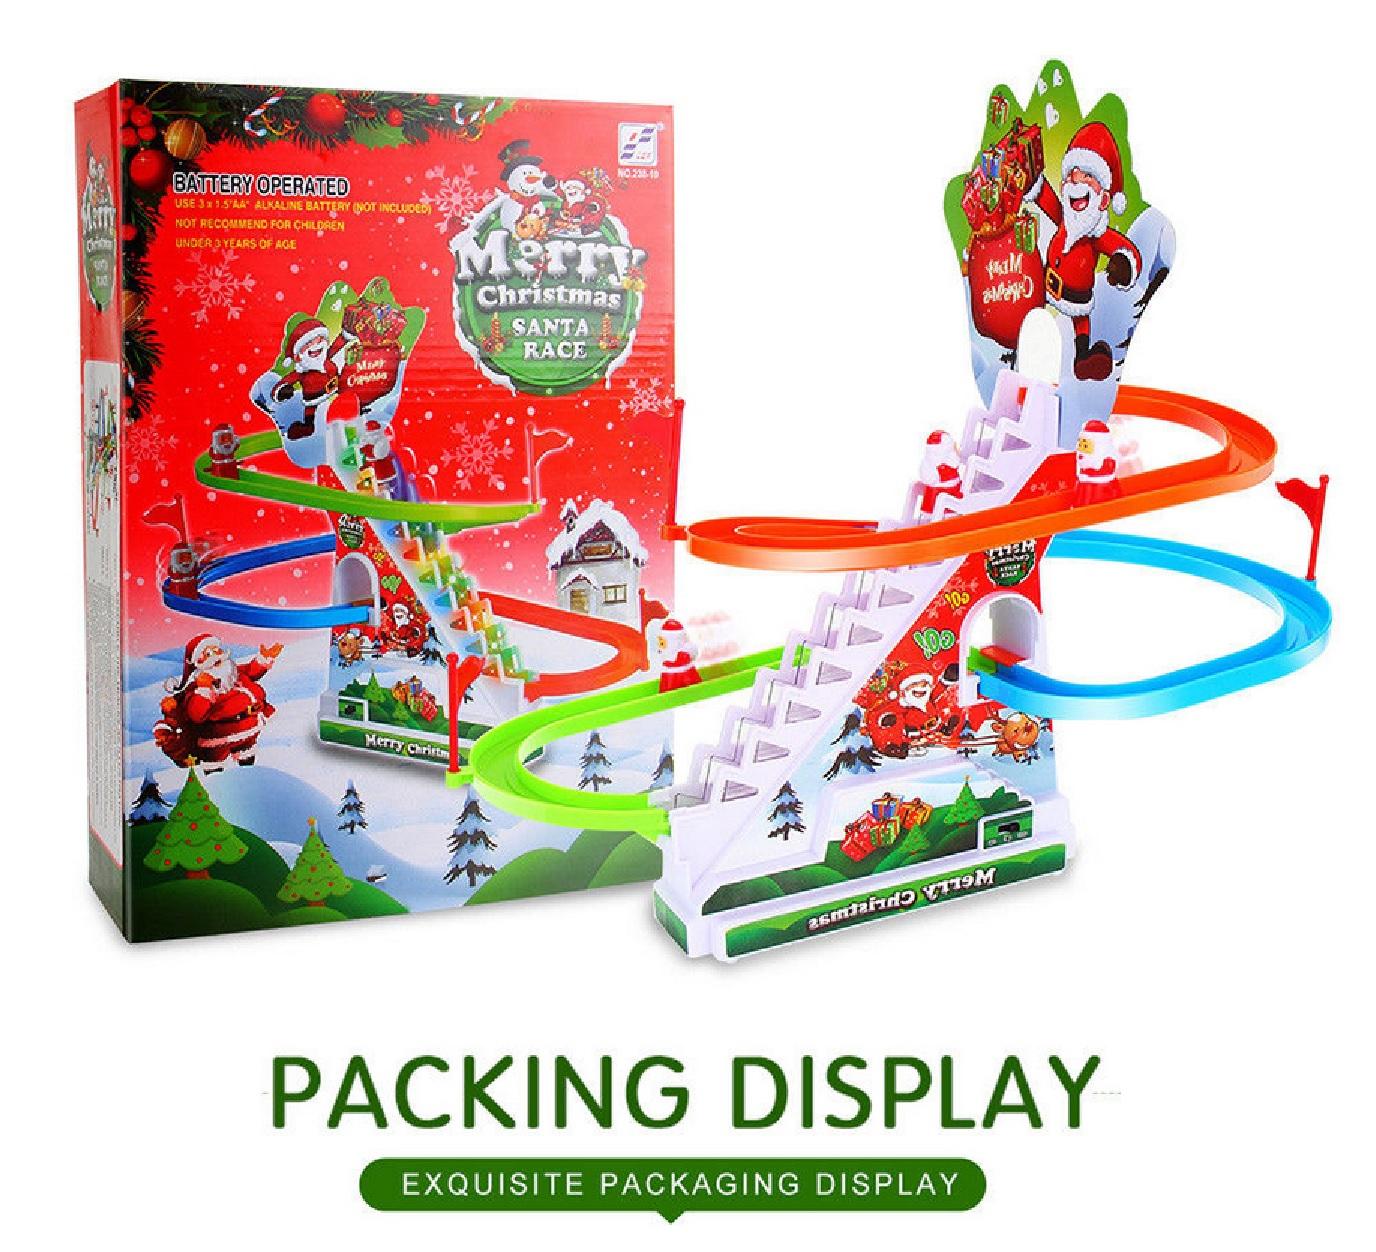 KIDS TOYS SANTA CLAUS SLIDE GAME CLASSIC RACER TRACK CHRISTMAS MUSIC ...